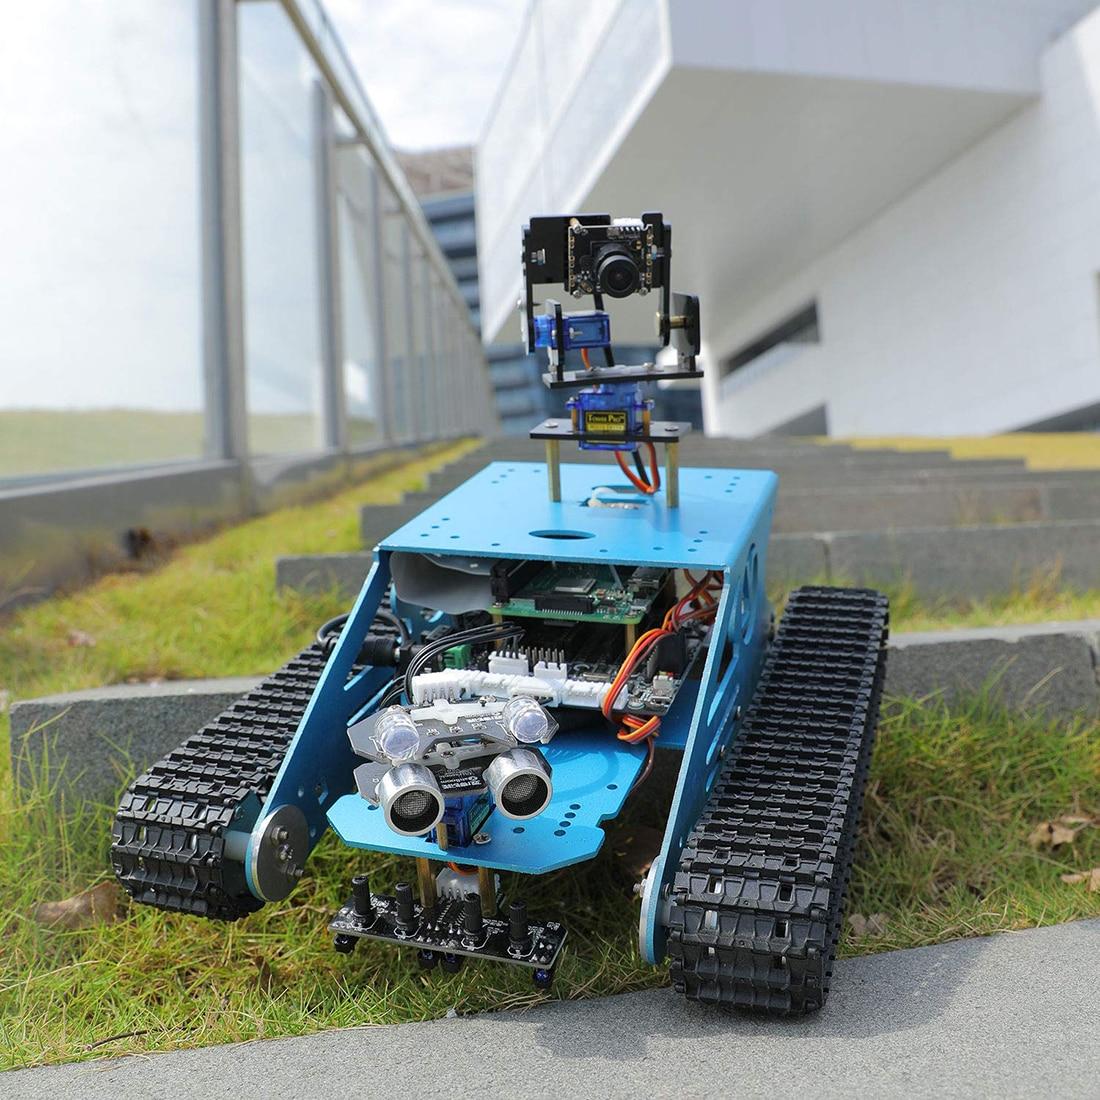 Tracked Tank Smart Robotic Bluetooth Video Programming Toy Diy Self-Balance Car Robot Kit With Raspberry 4B (1G/2G/4G Memory)